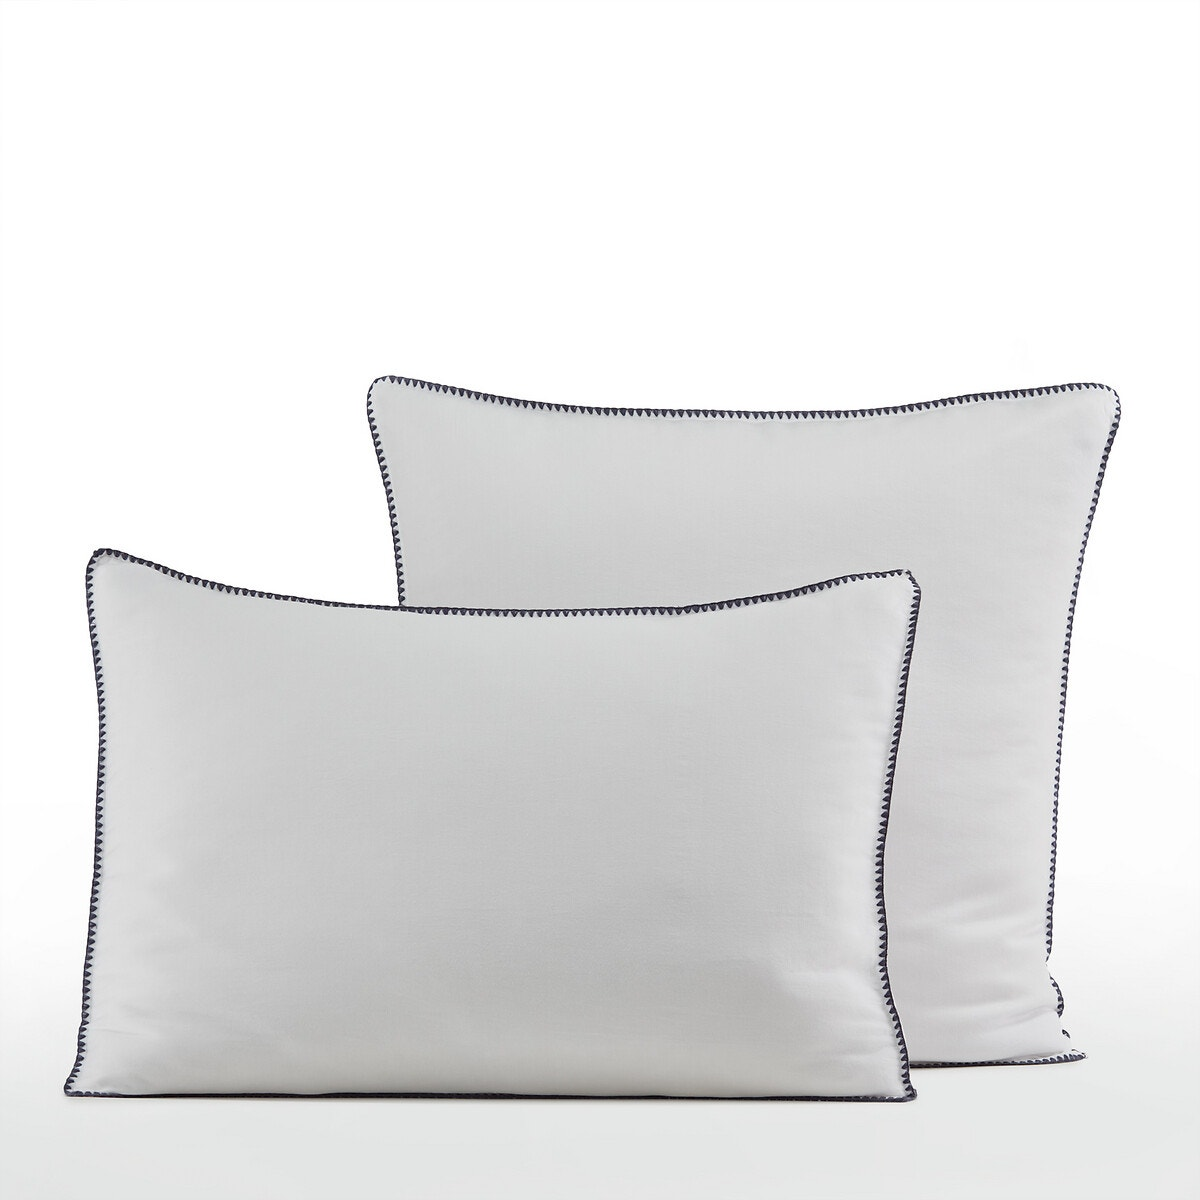 Satina オーガニックコットン サテン/リヨセル 枕カバー